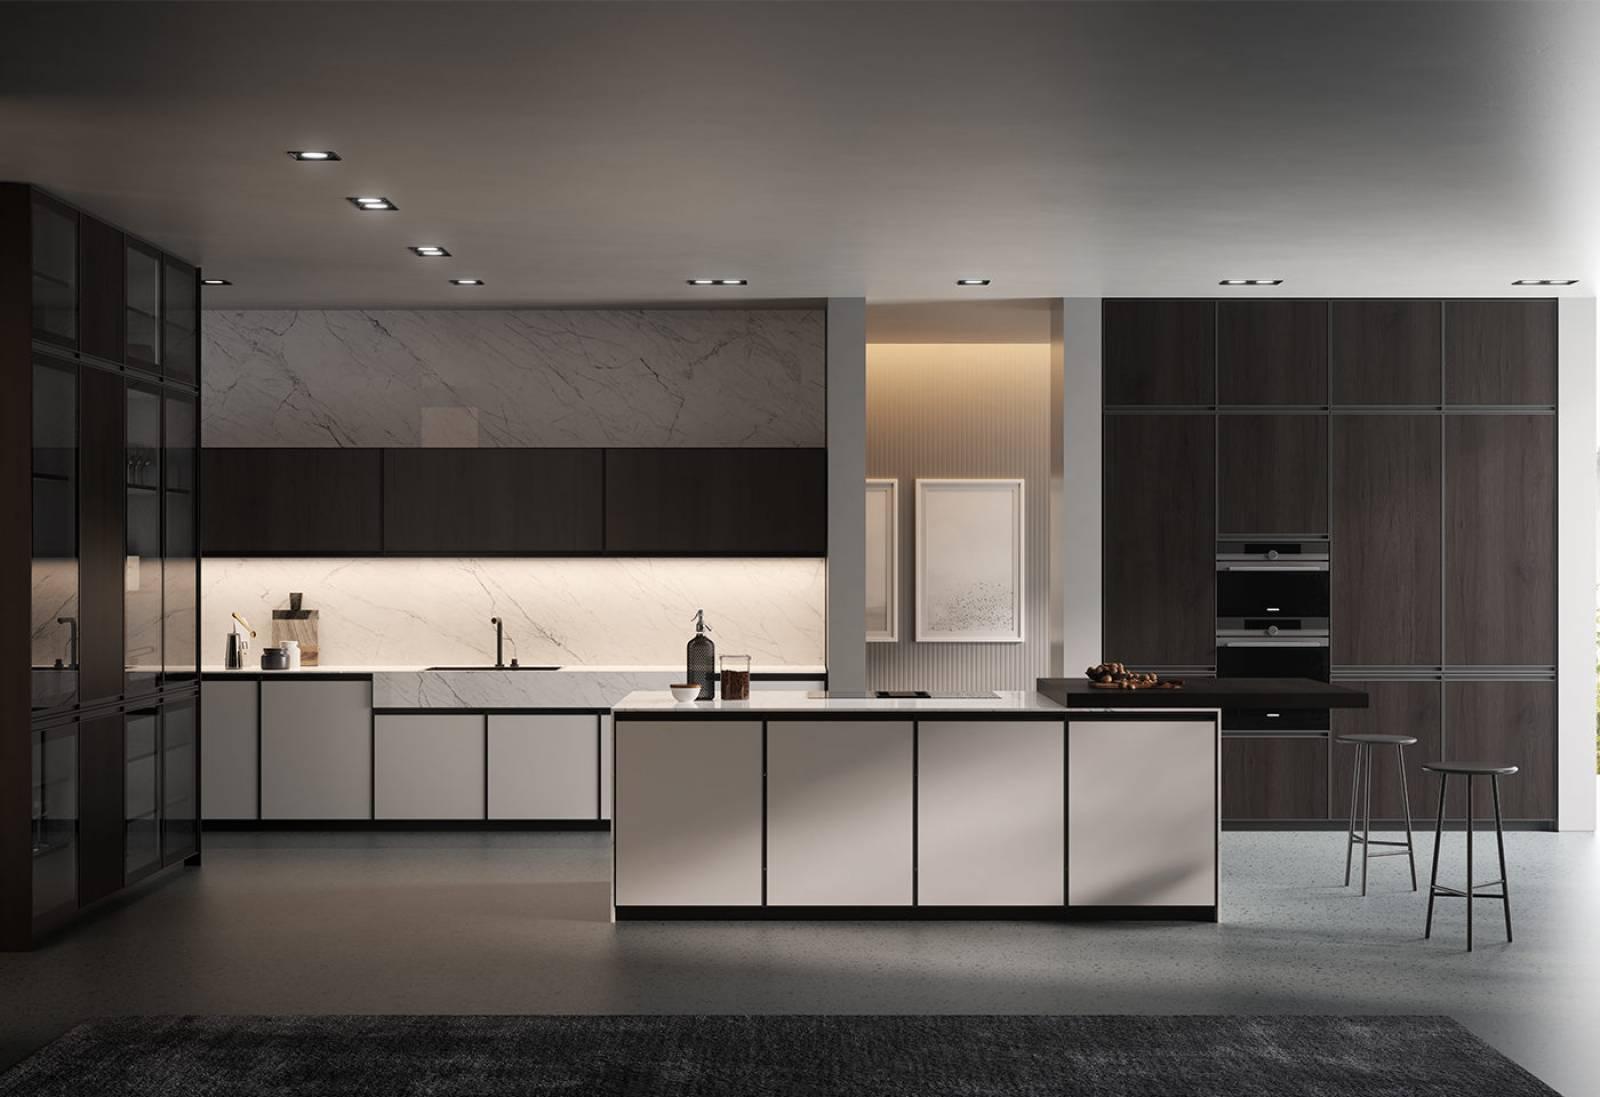 Poignée De Porte Cuisine Design cuisine moderne porte à cadre aluminium poignée intégrée